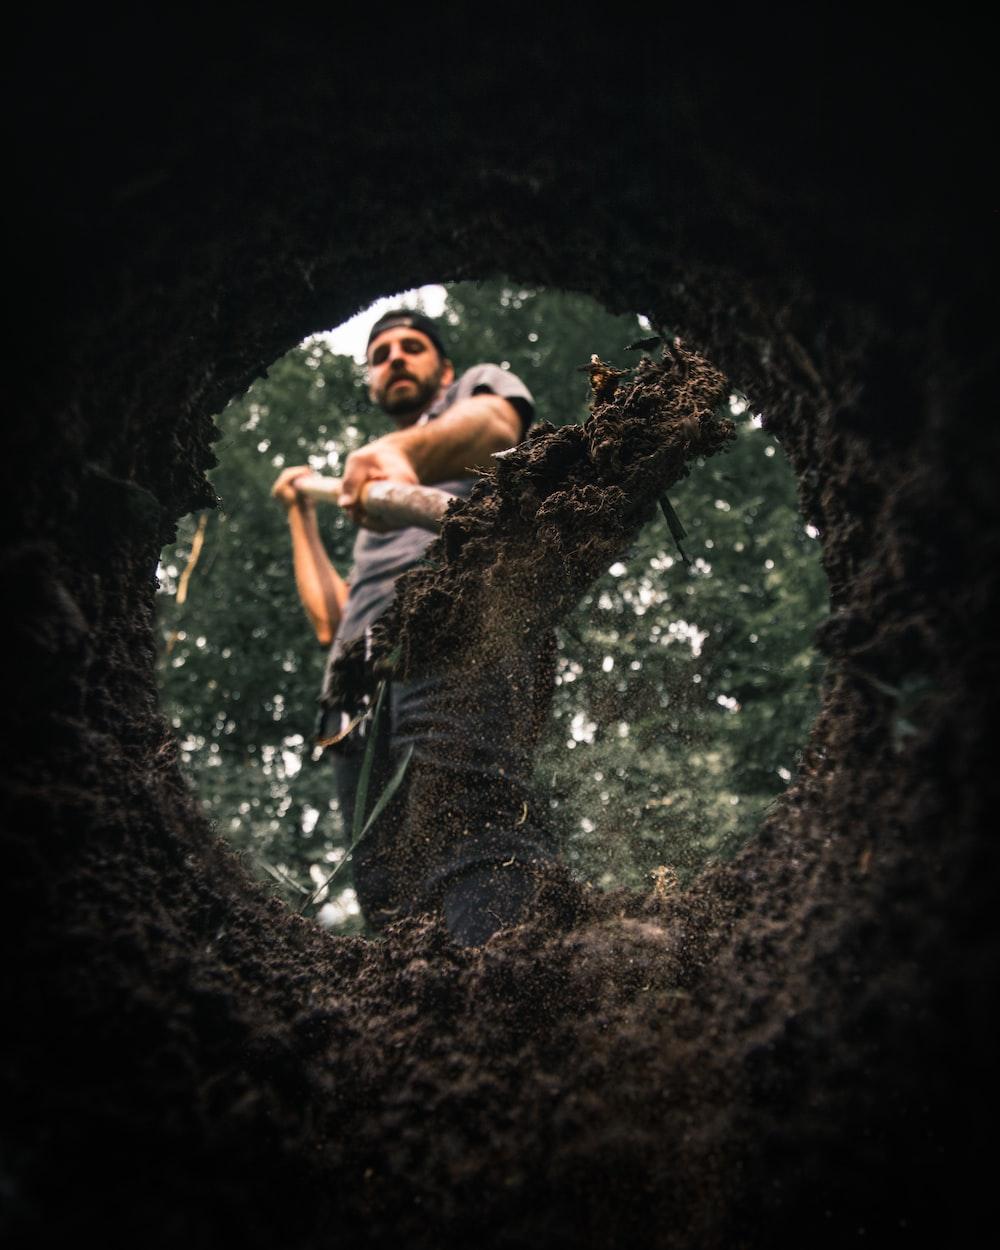 man standing near hole